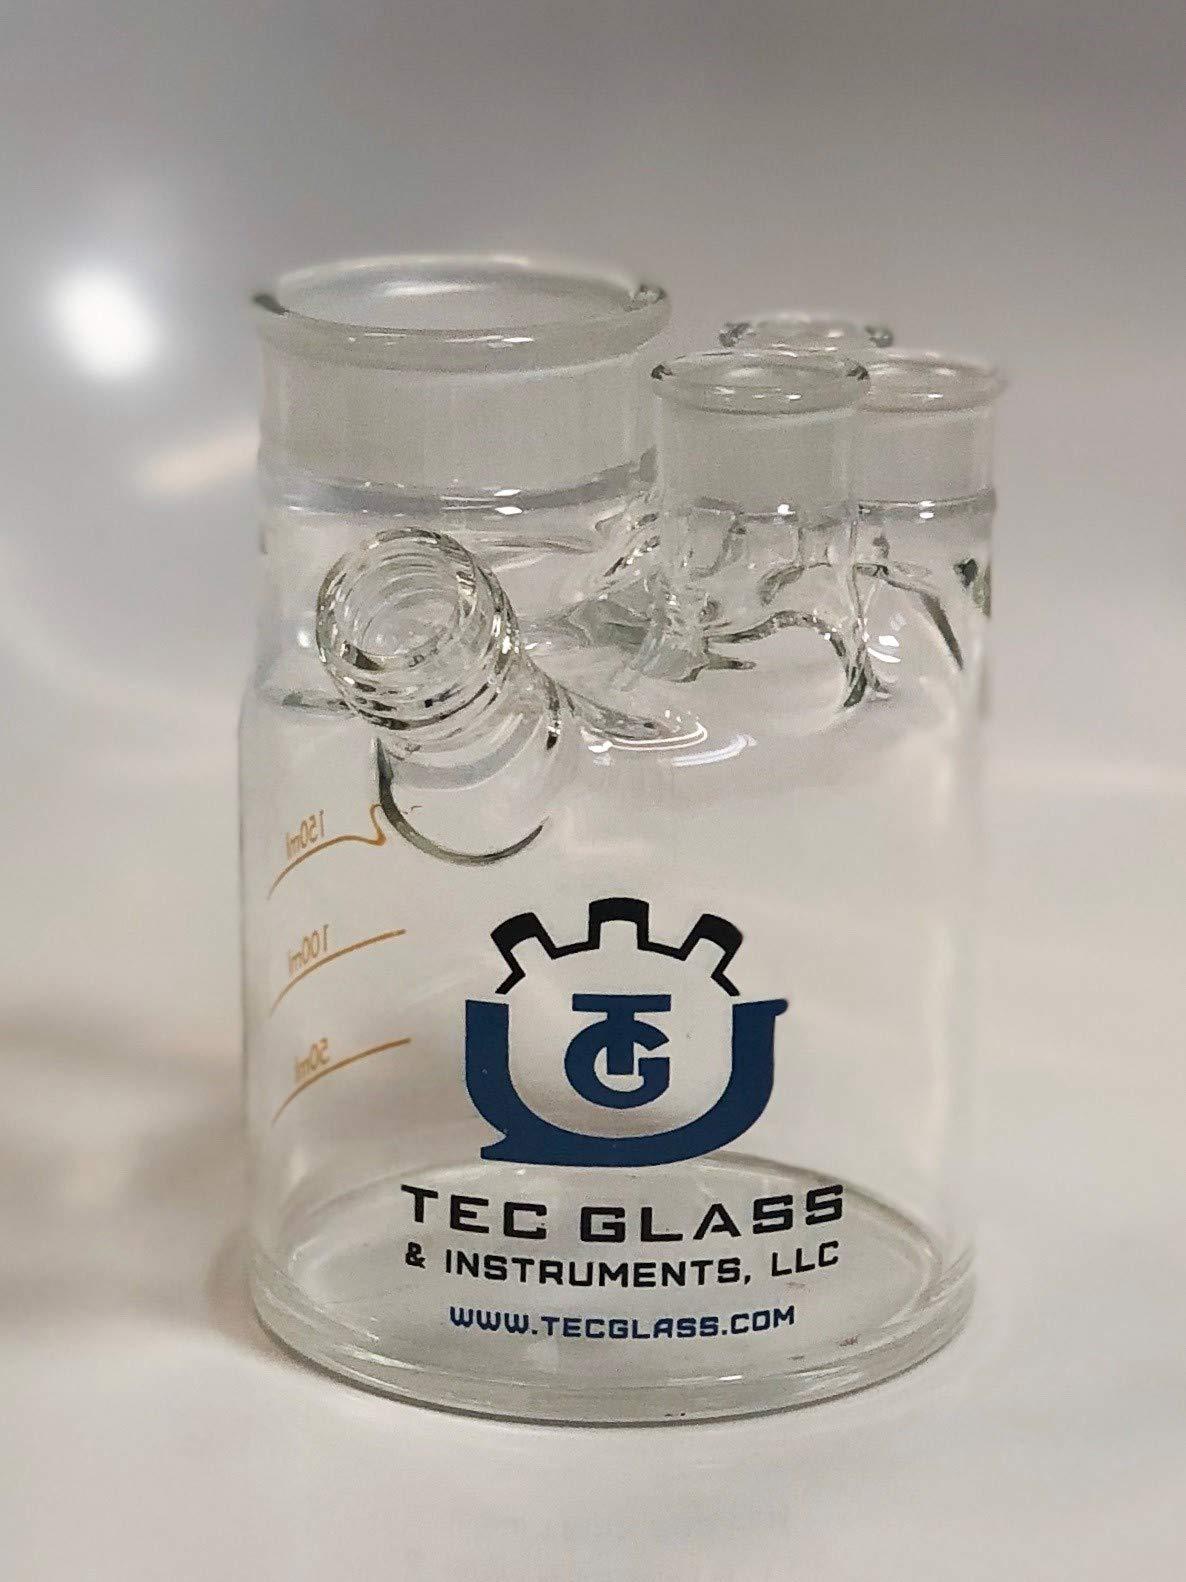 Titration Vessel for Aquatest 2010 by Tecglass & Instruments